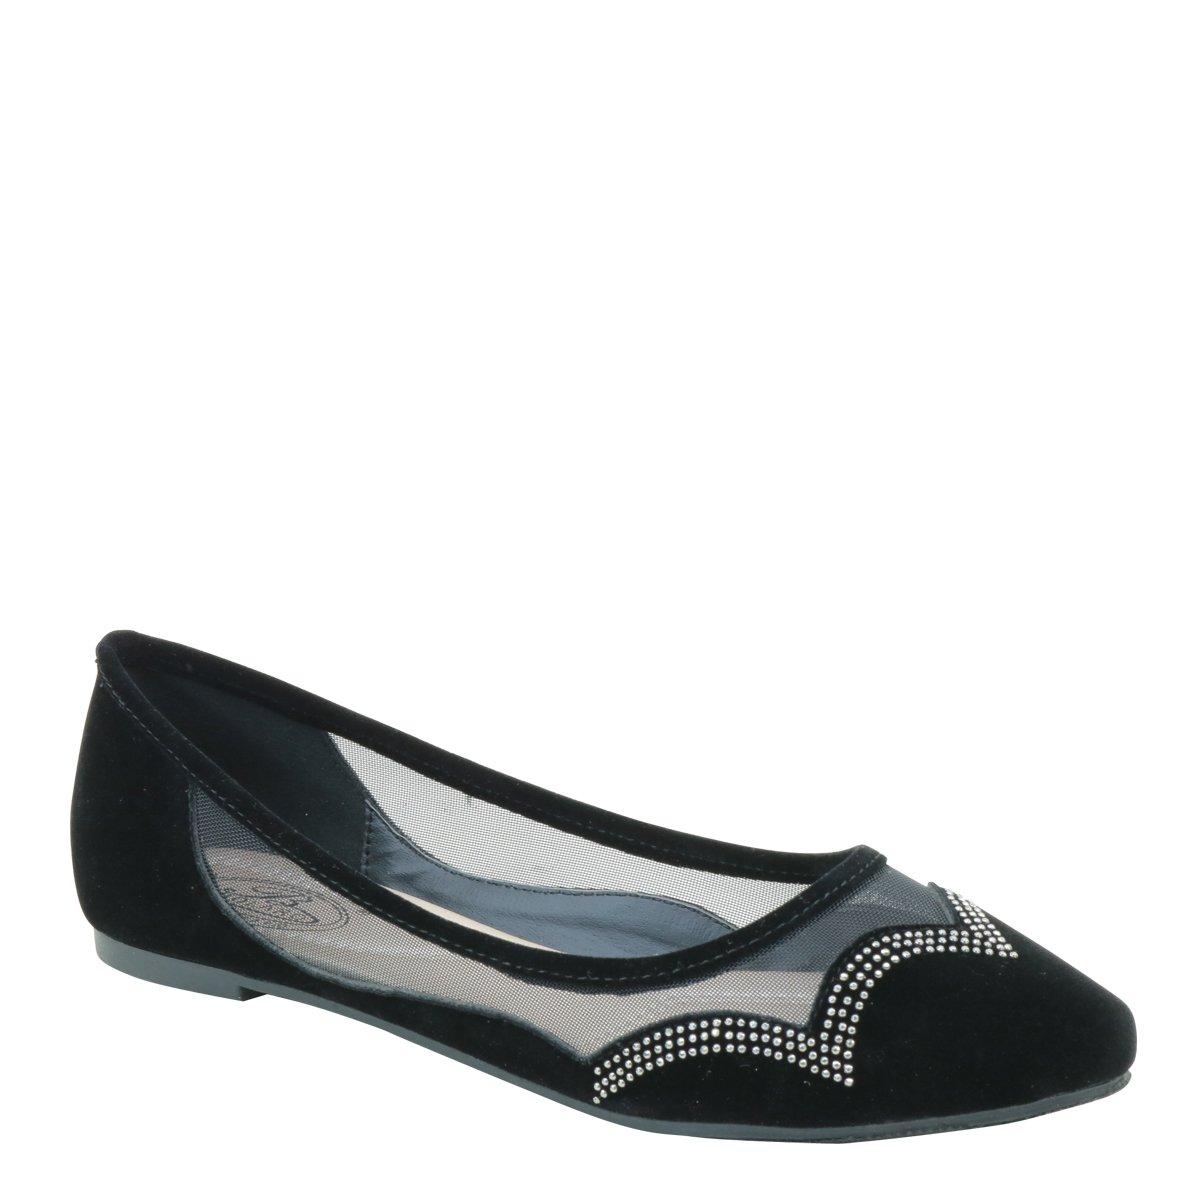 New Brieten Women's Rhinestone Mesh Pointed Toe Flats Comfortable Shoes B06XCW17QH 7.5 B(M) US|Black